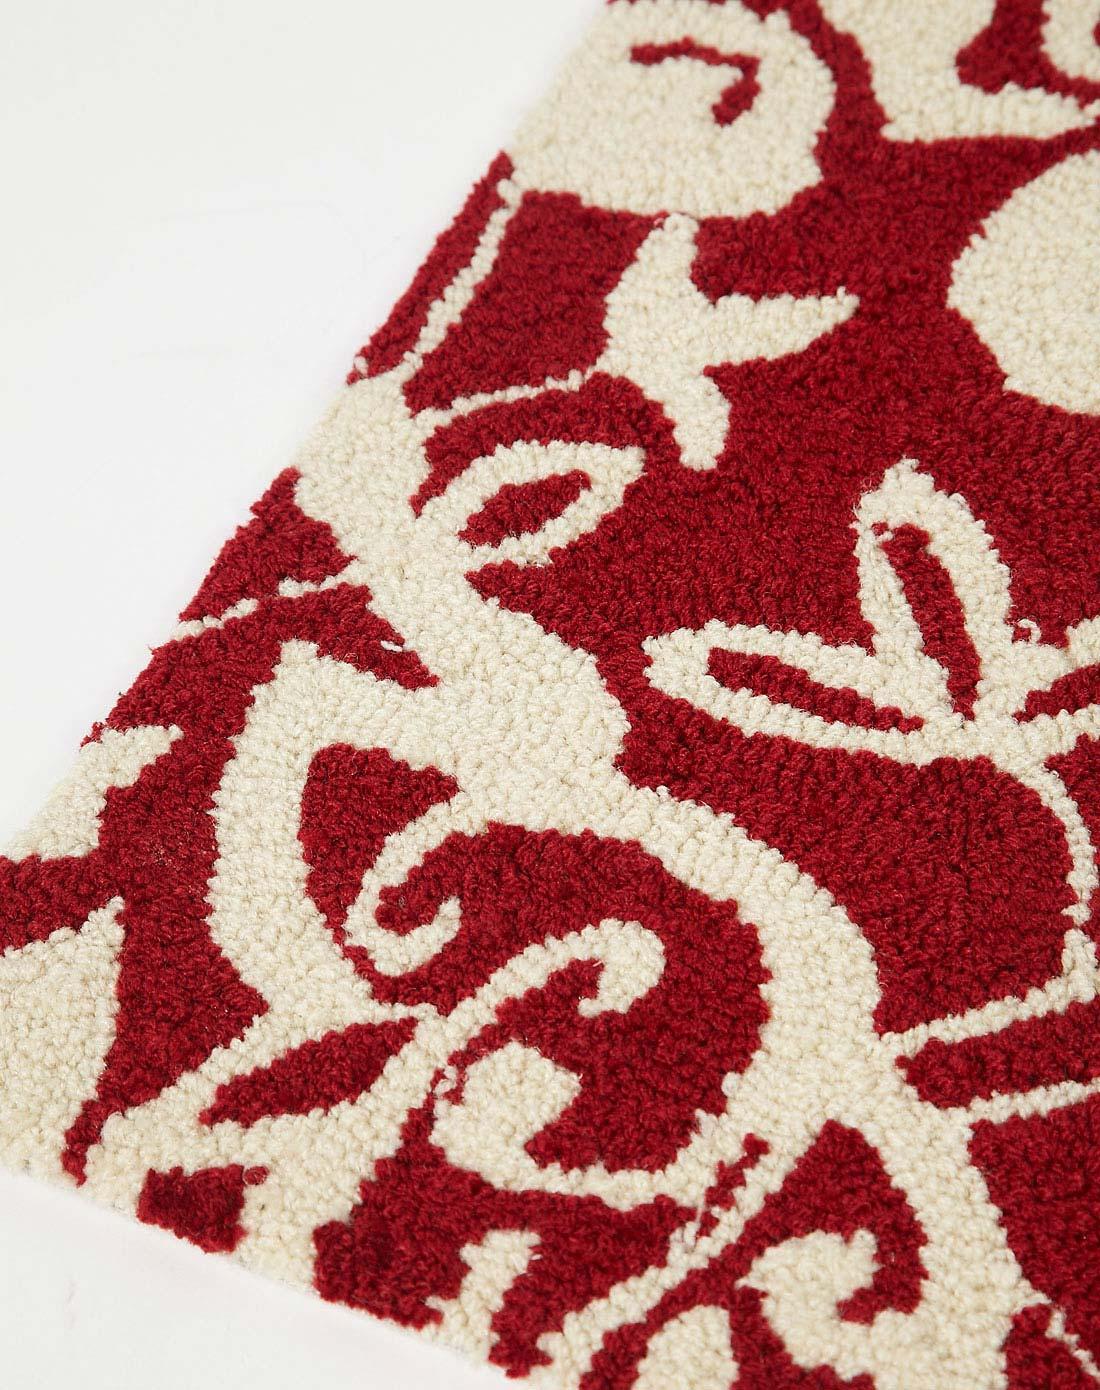 85*45cm超大柔软高级手工编织地毯